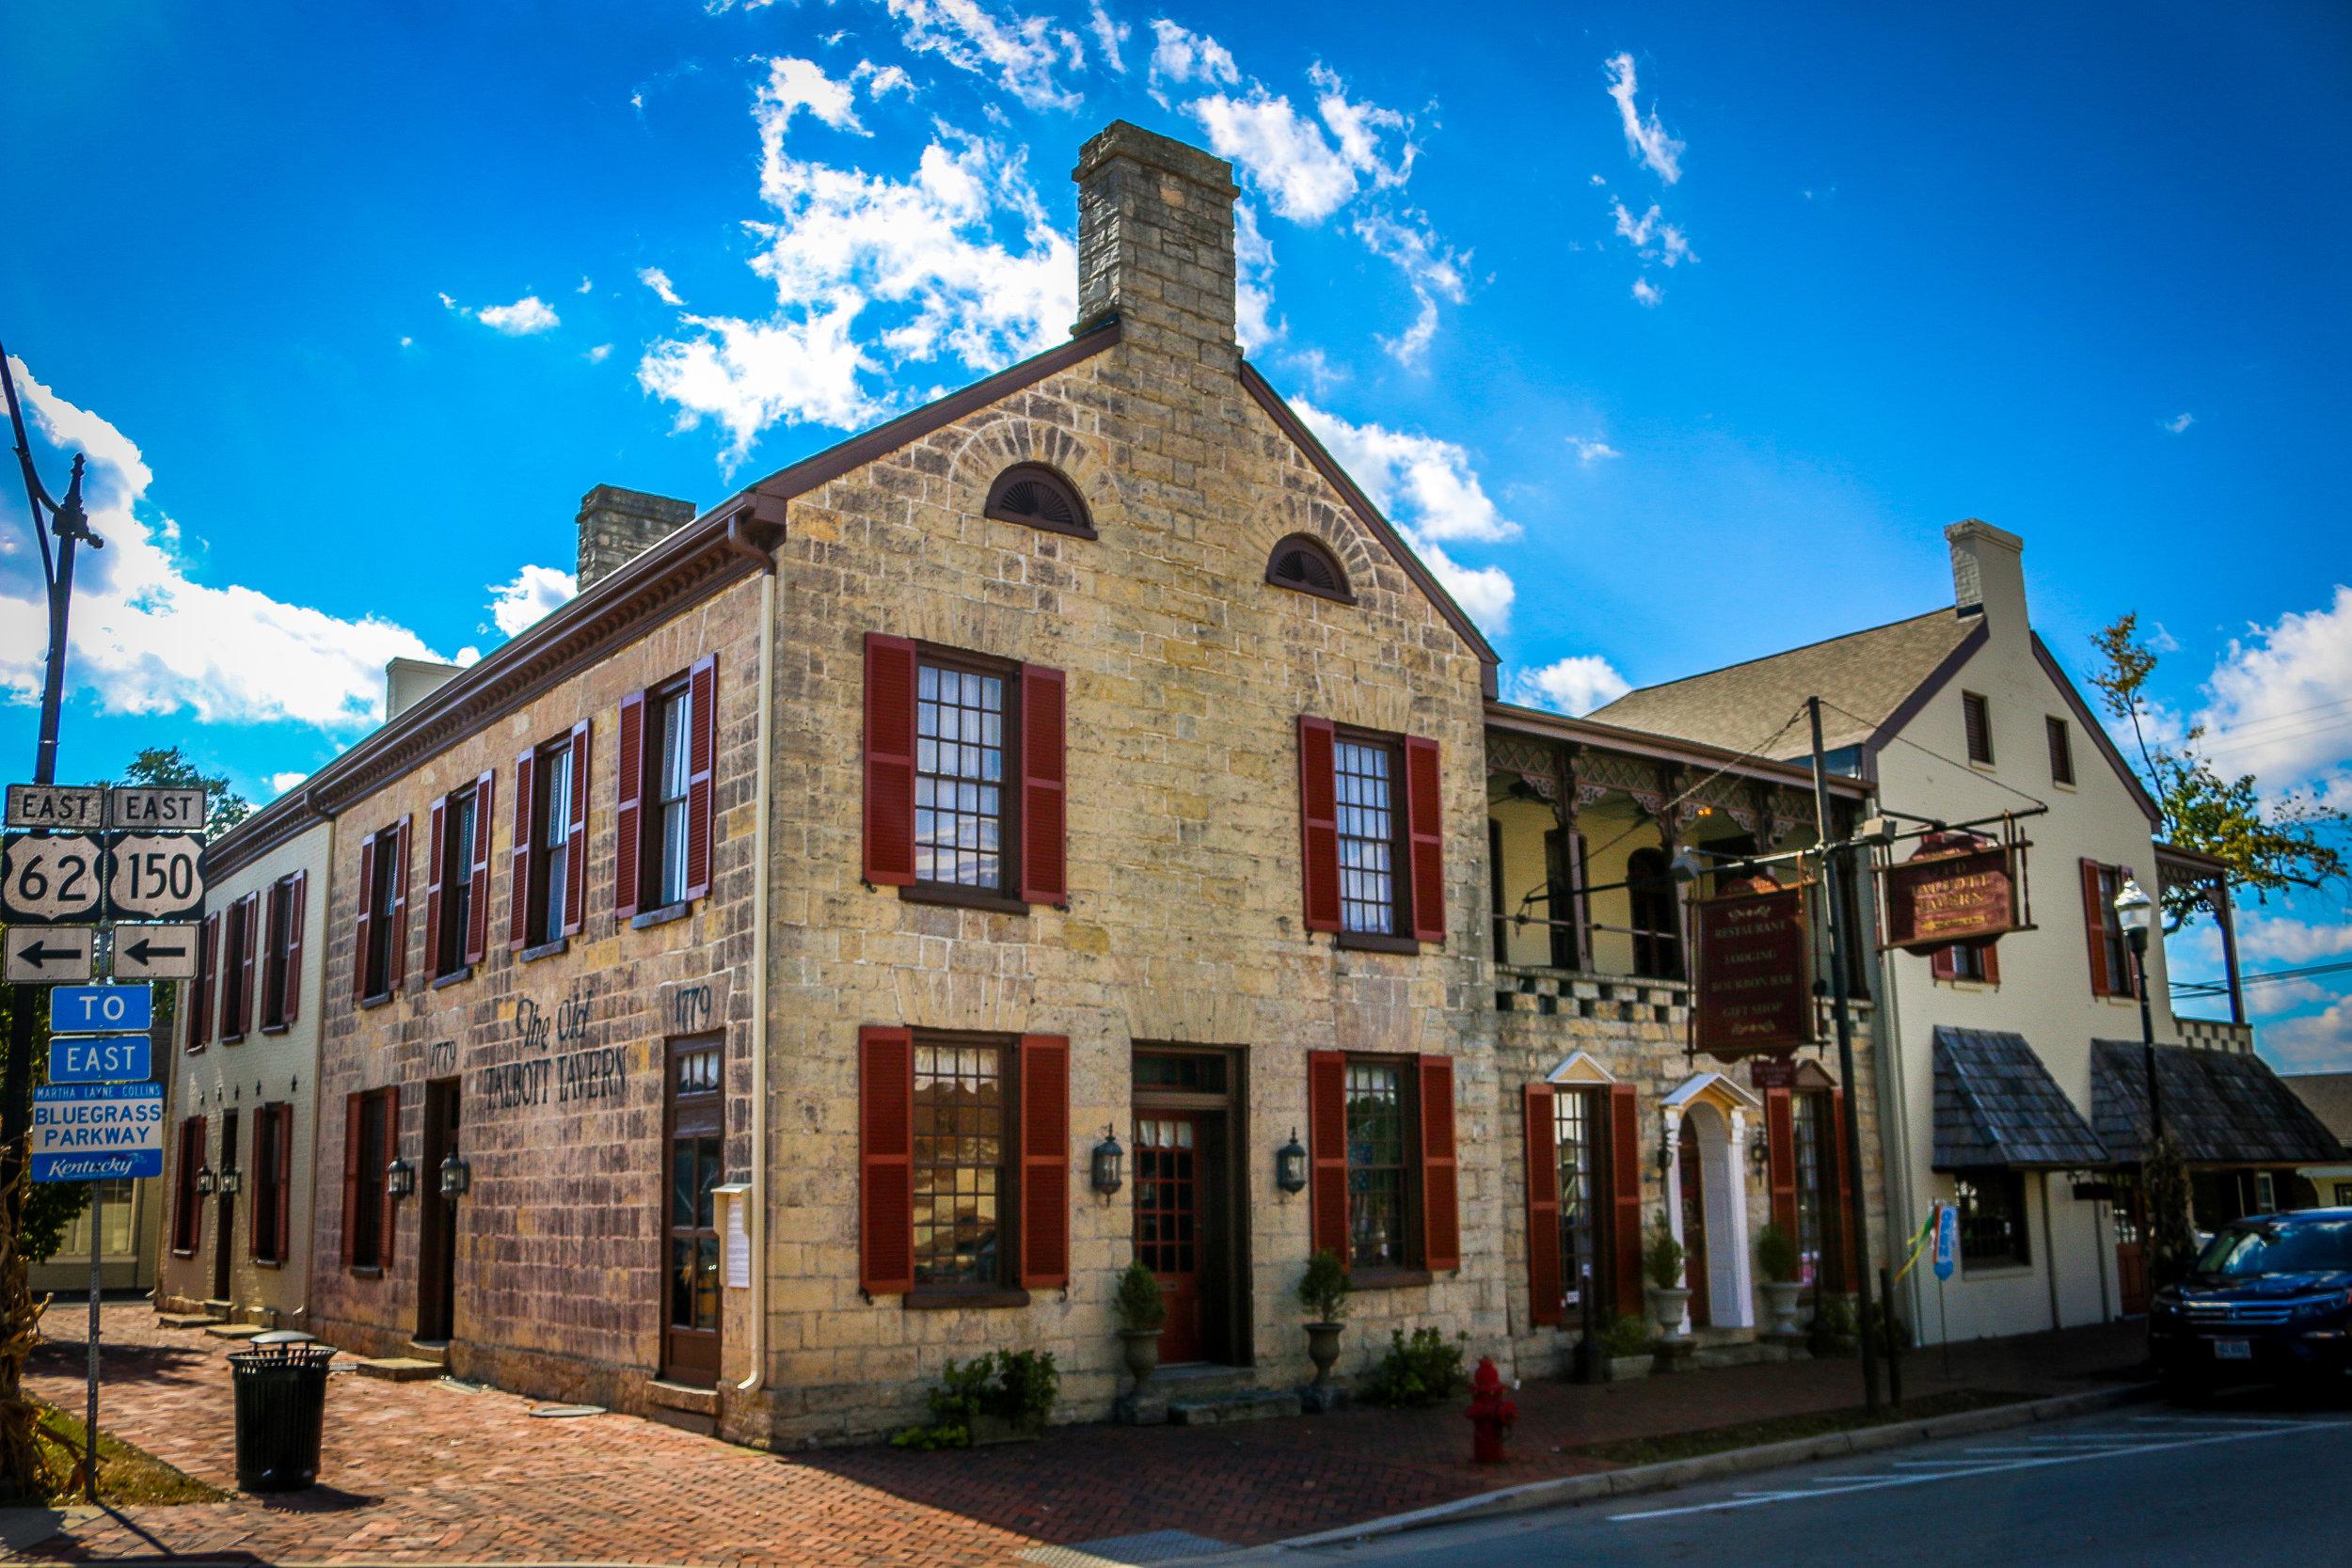 Historic Talbot Tavern in Bardstown